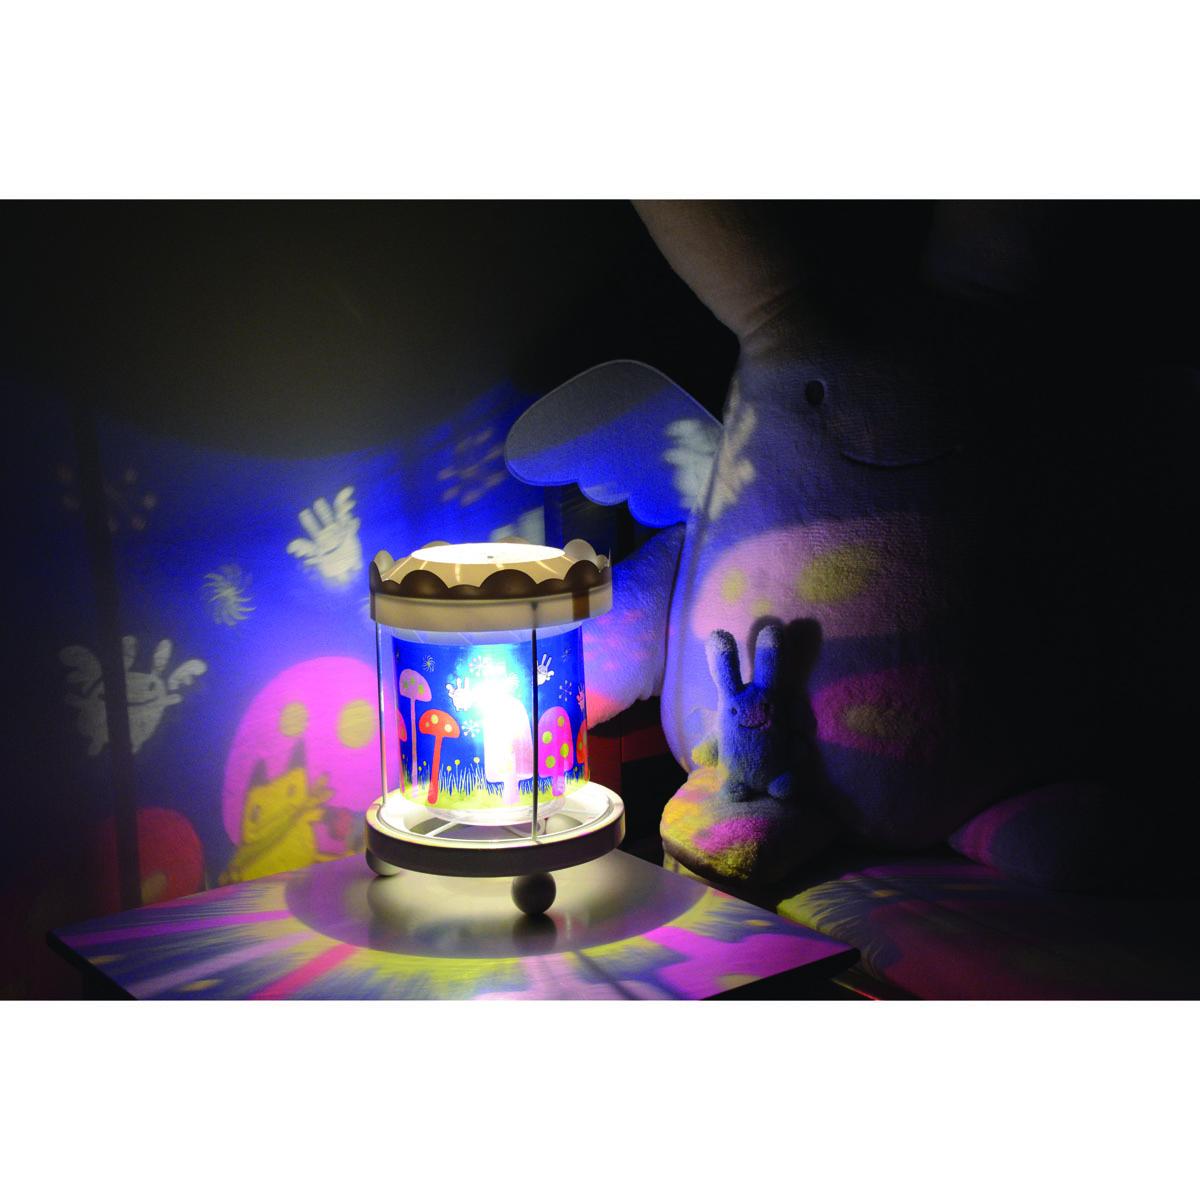 Lanterne Blanc Lanterne Ange Manège Lapin Manège GSMpzqUV